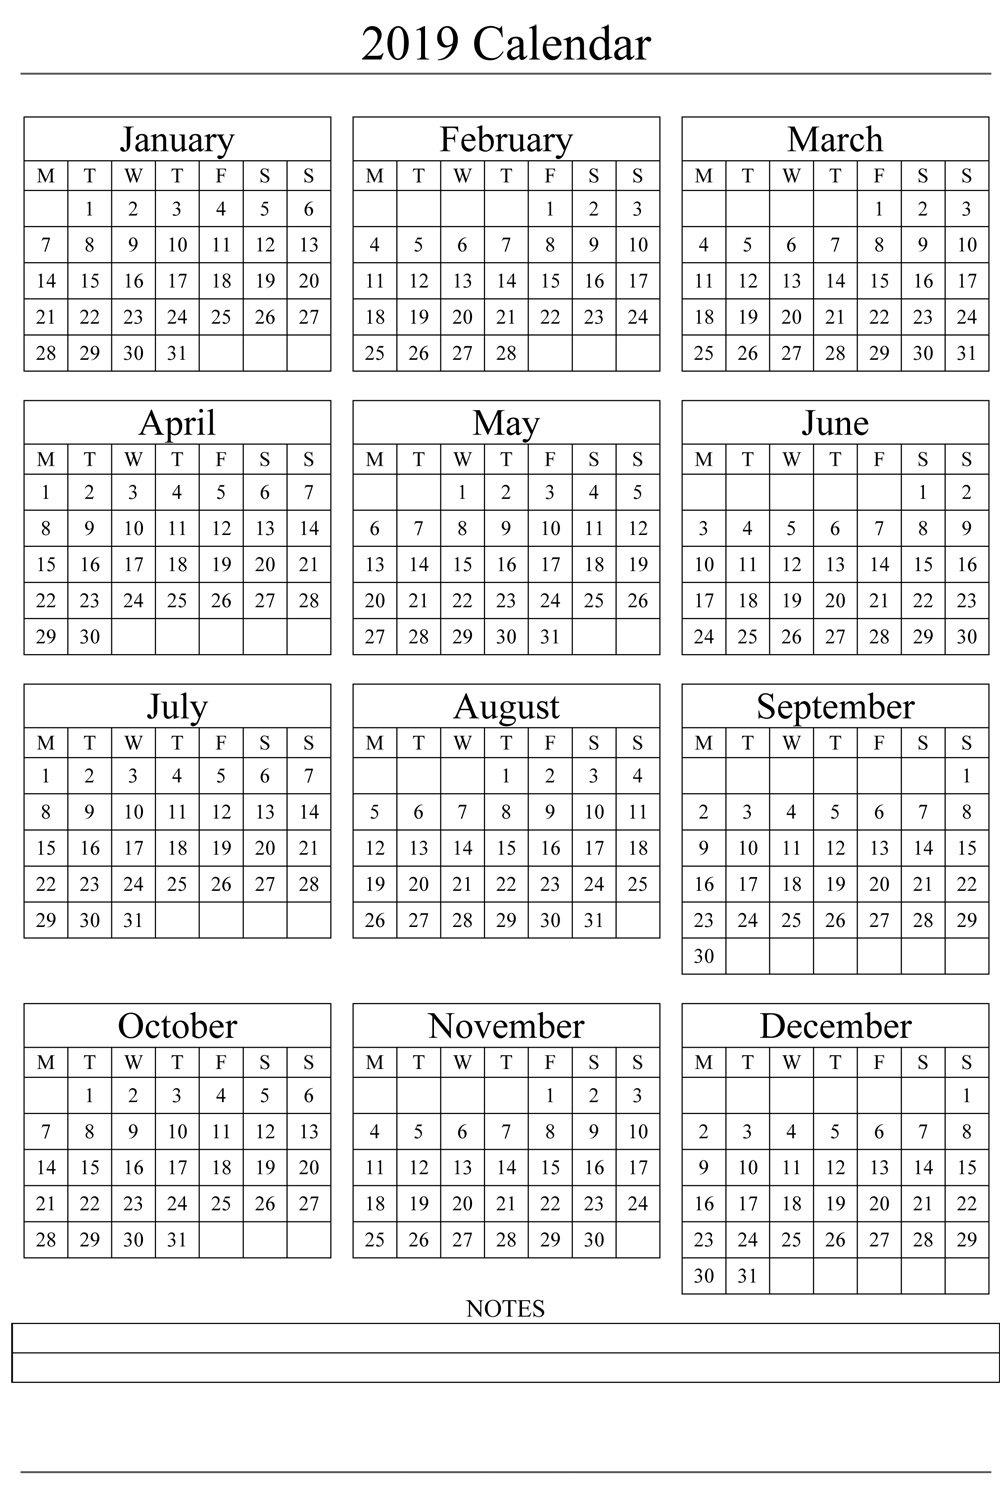 2019 Yearly Calendar Printable Templates – Holidays, Pdf Word Excel 544 Calendar 2019